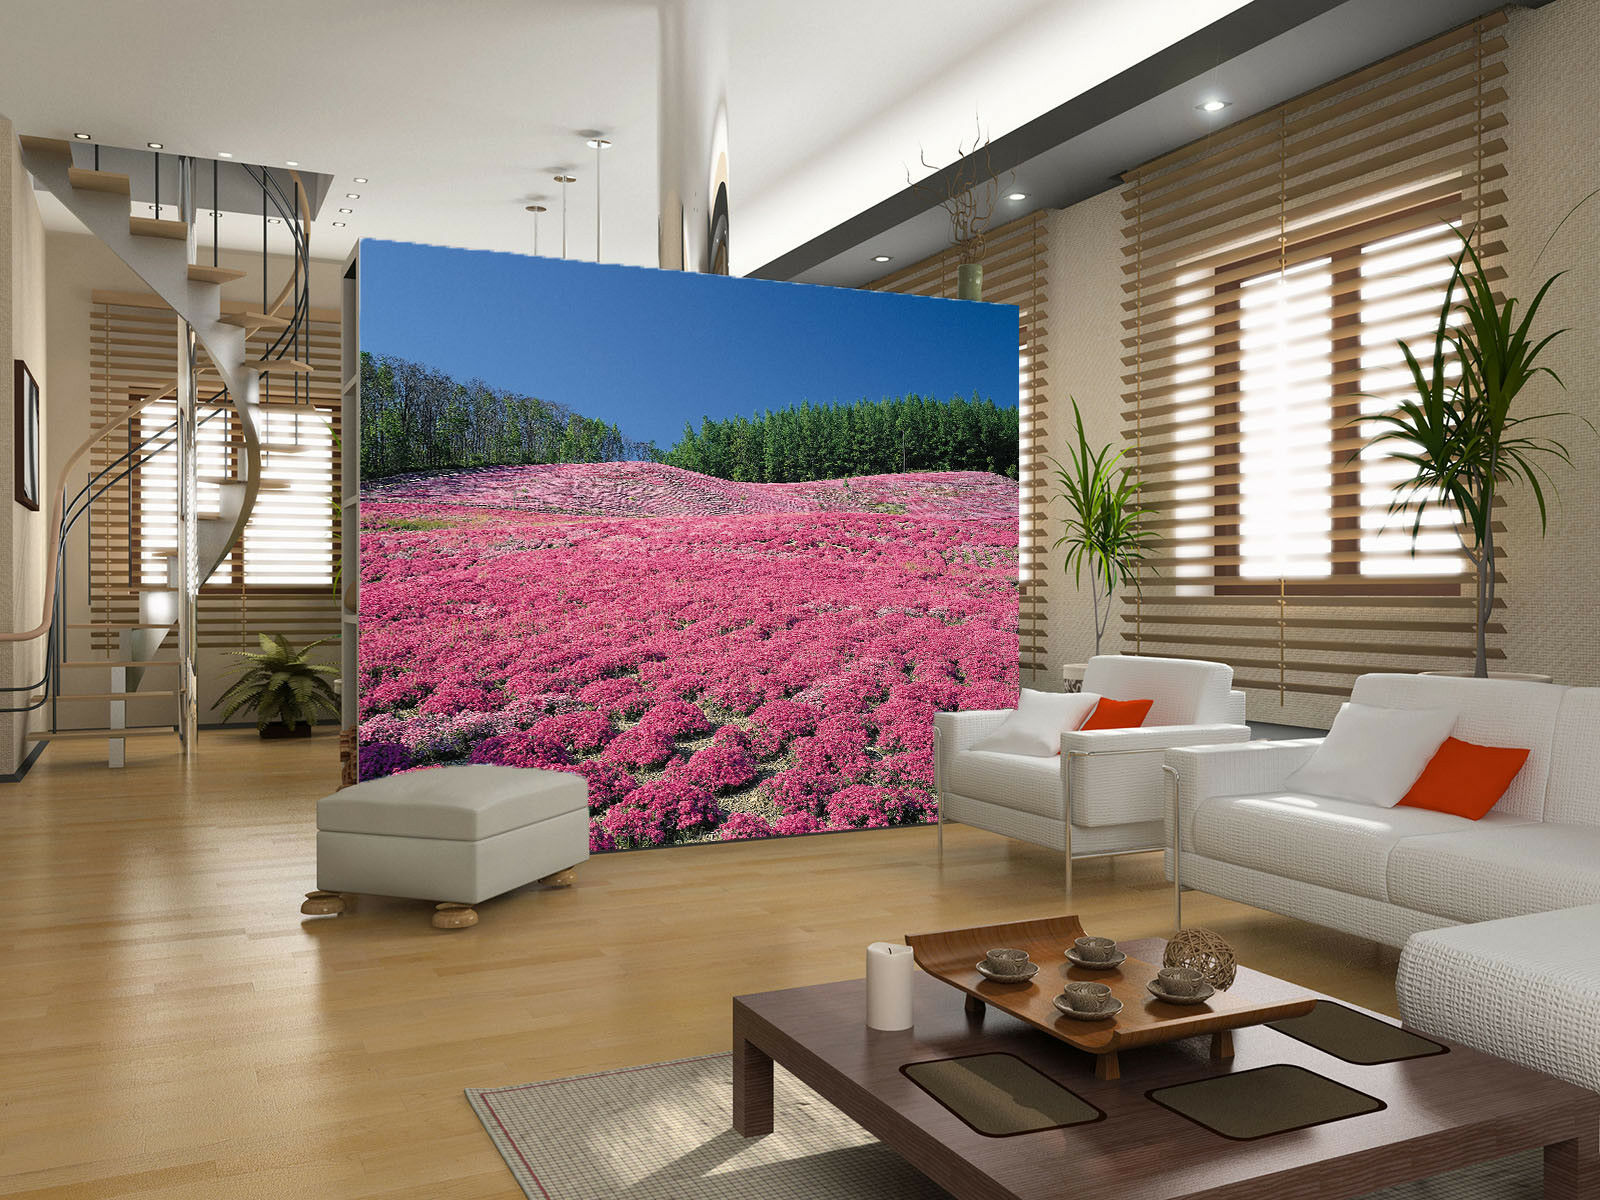 3D Baum pink bluemenfeld 74 Tapete Wandgemälde Tapete Tapeten Bild Familie DE